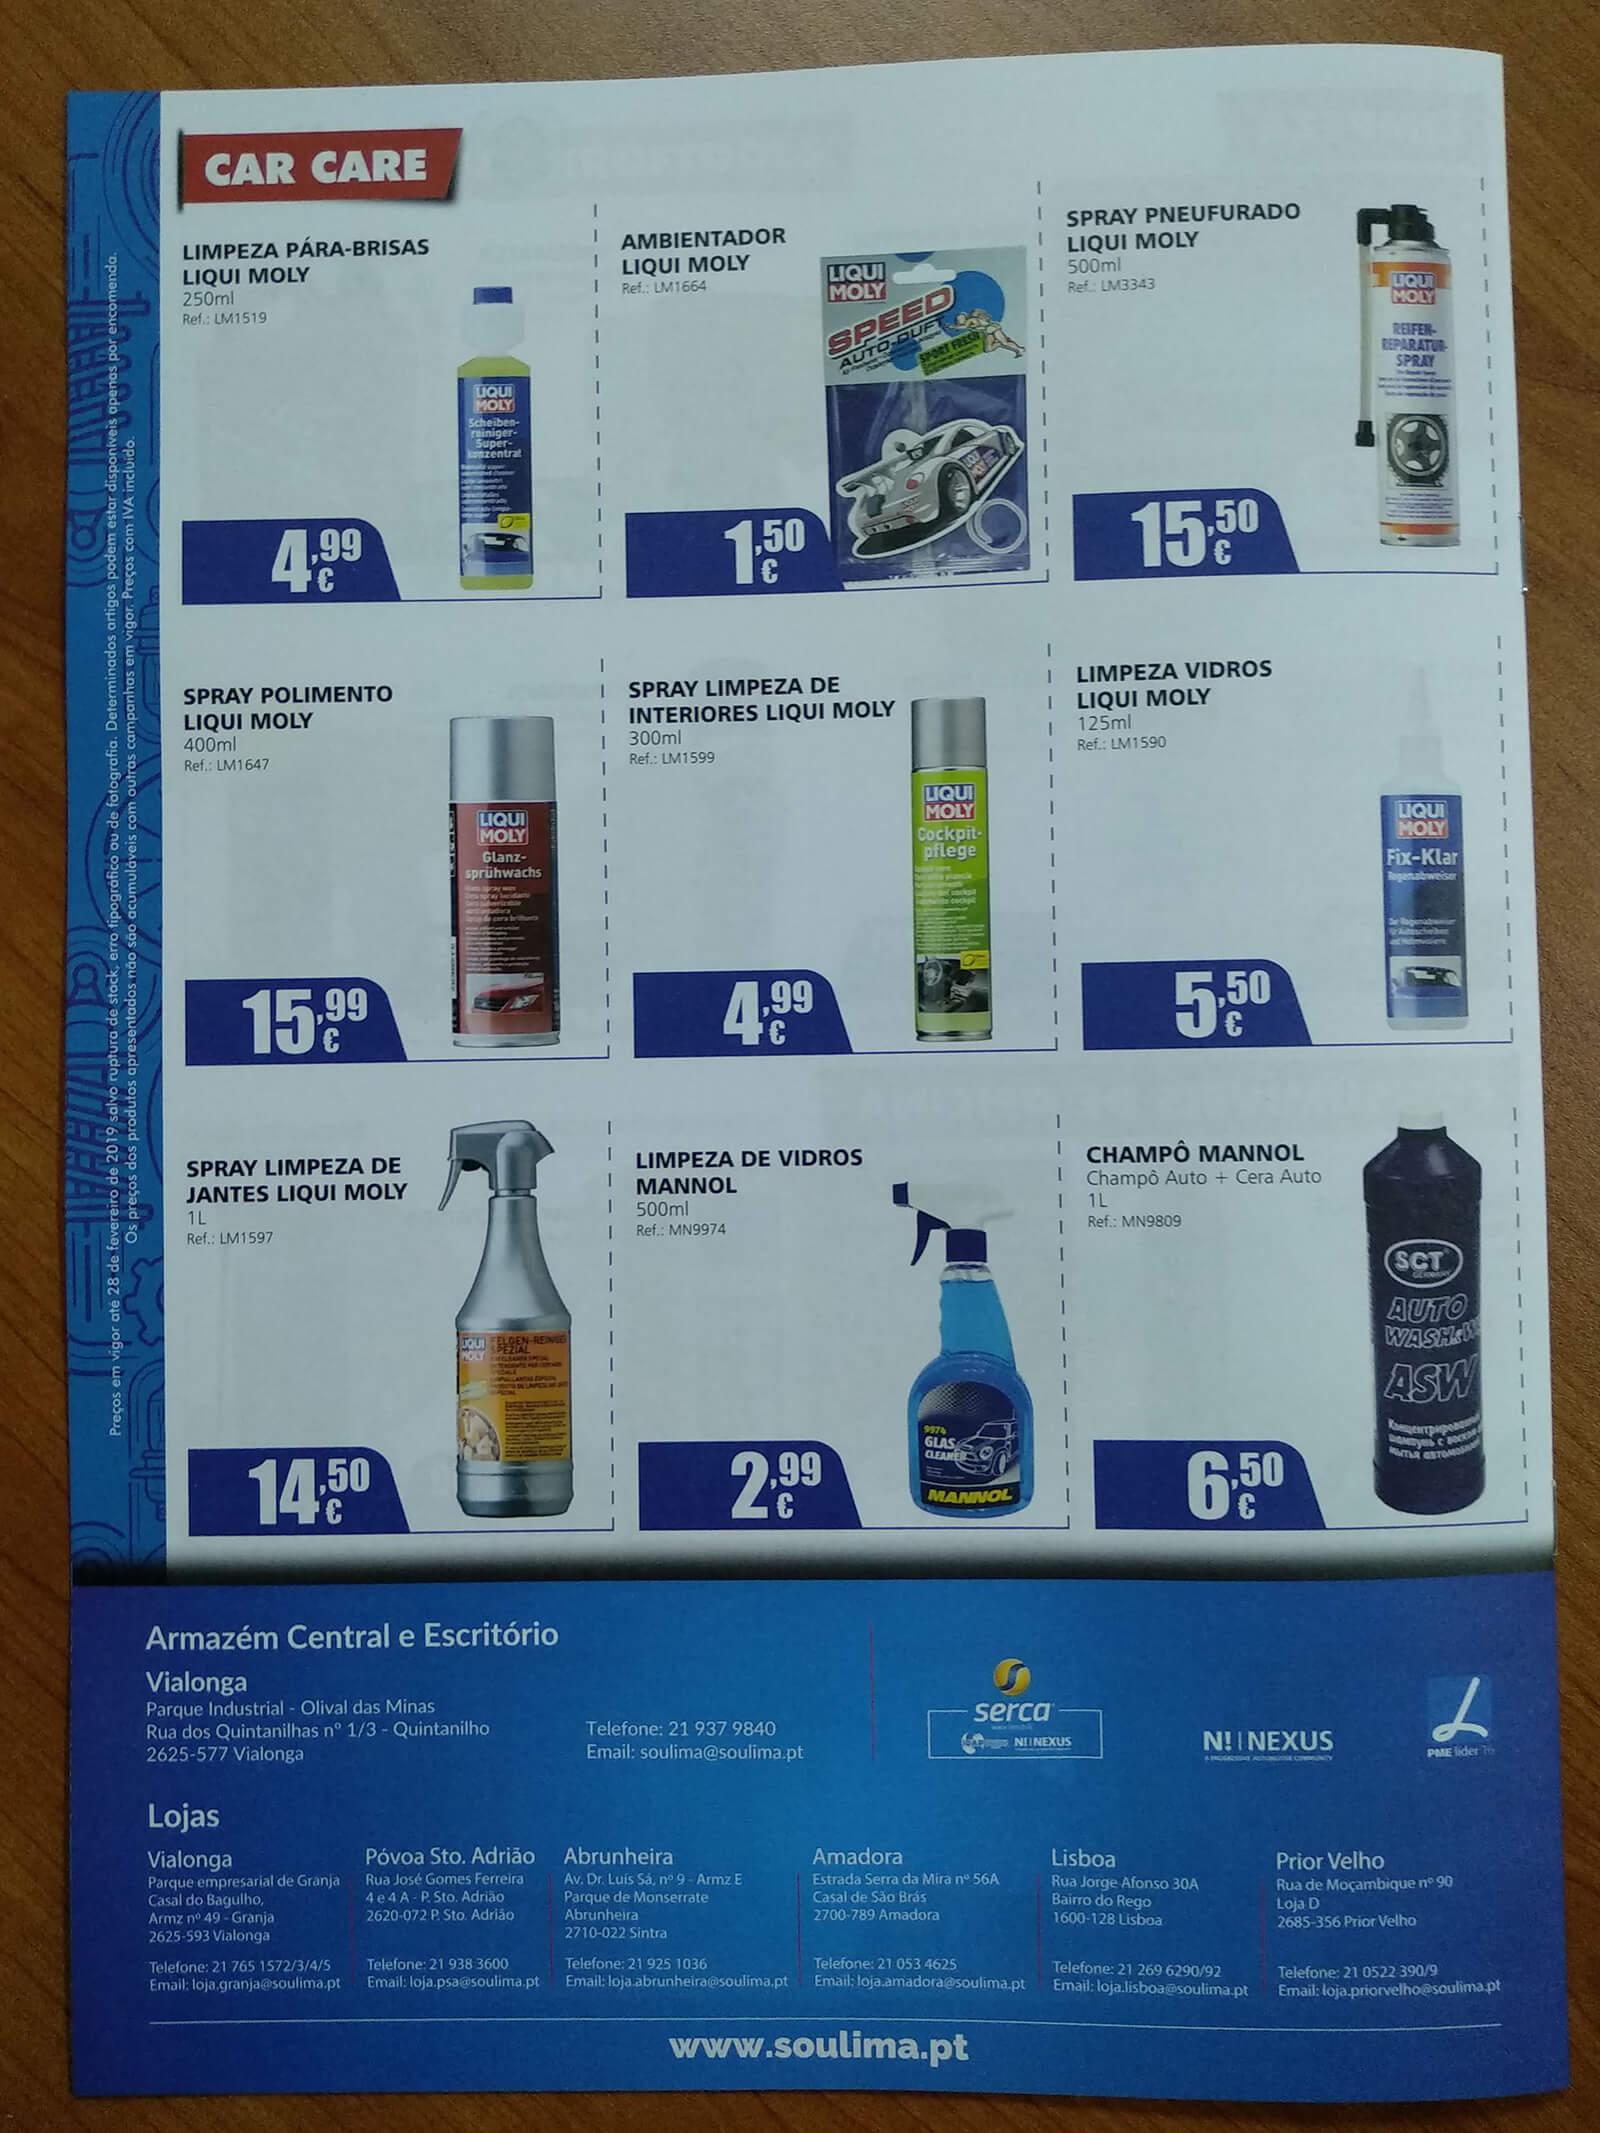 Soulima - Comércio de Peças - Printed Brochure Soulima - Back Cover | Way2Start - Design & Digital Agency